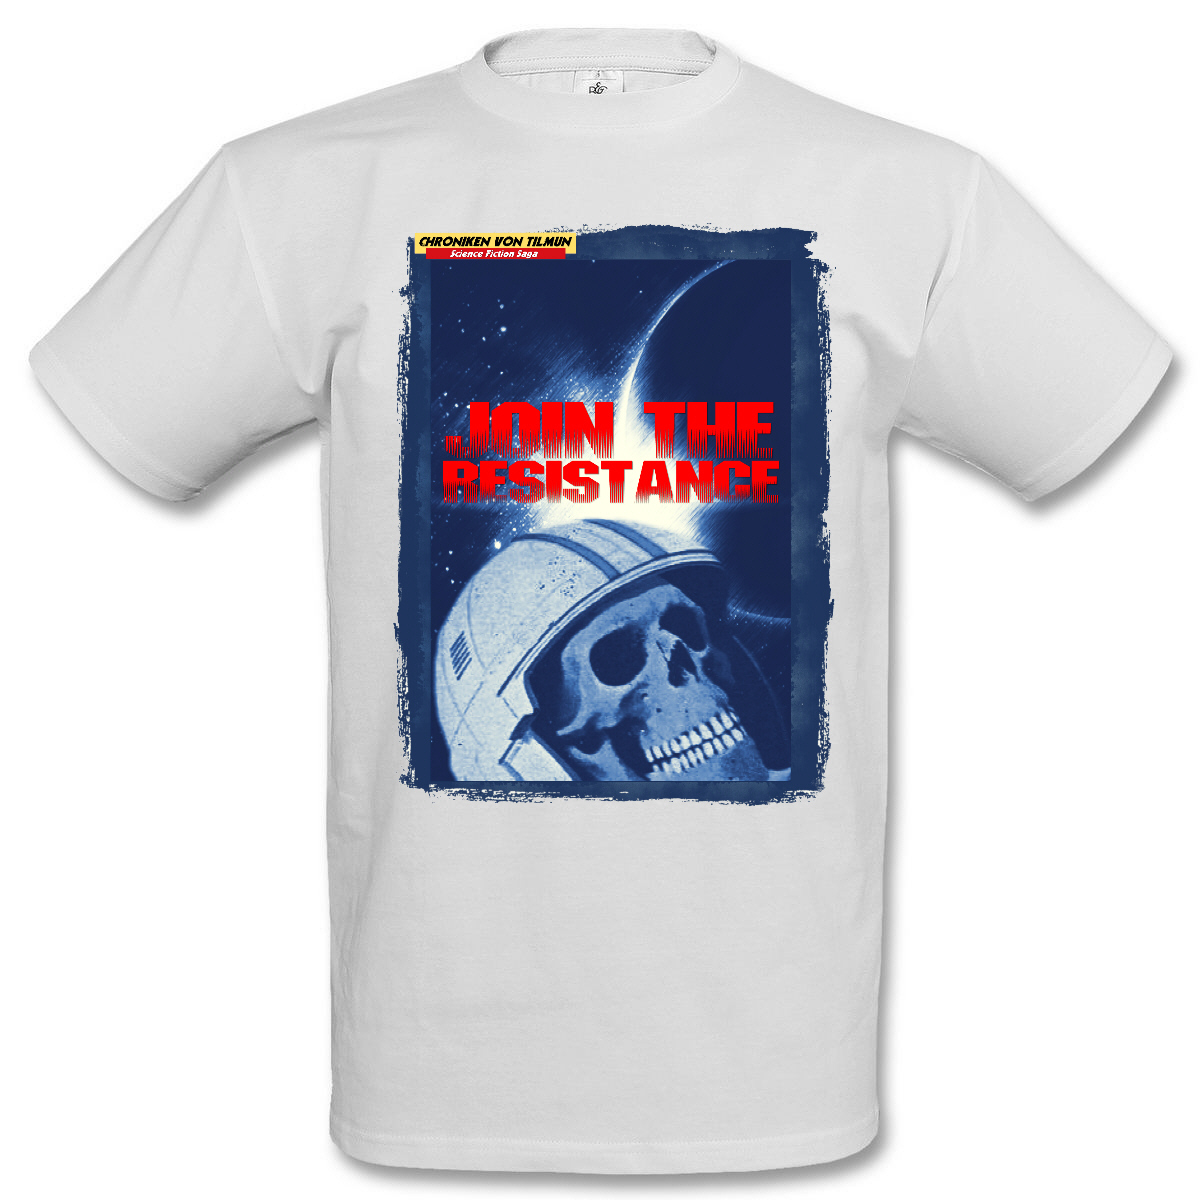 T-Shirt Resistance